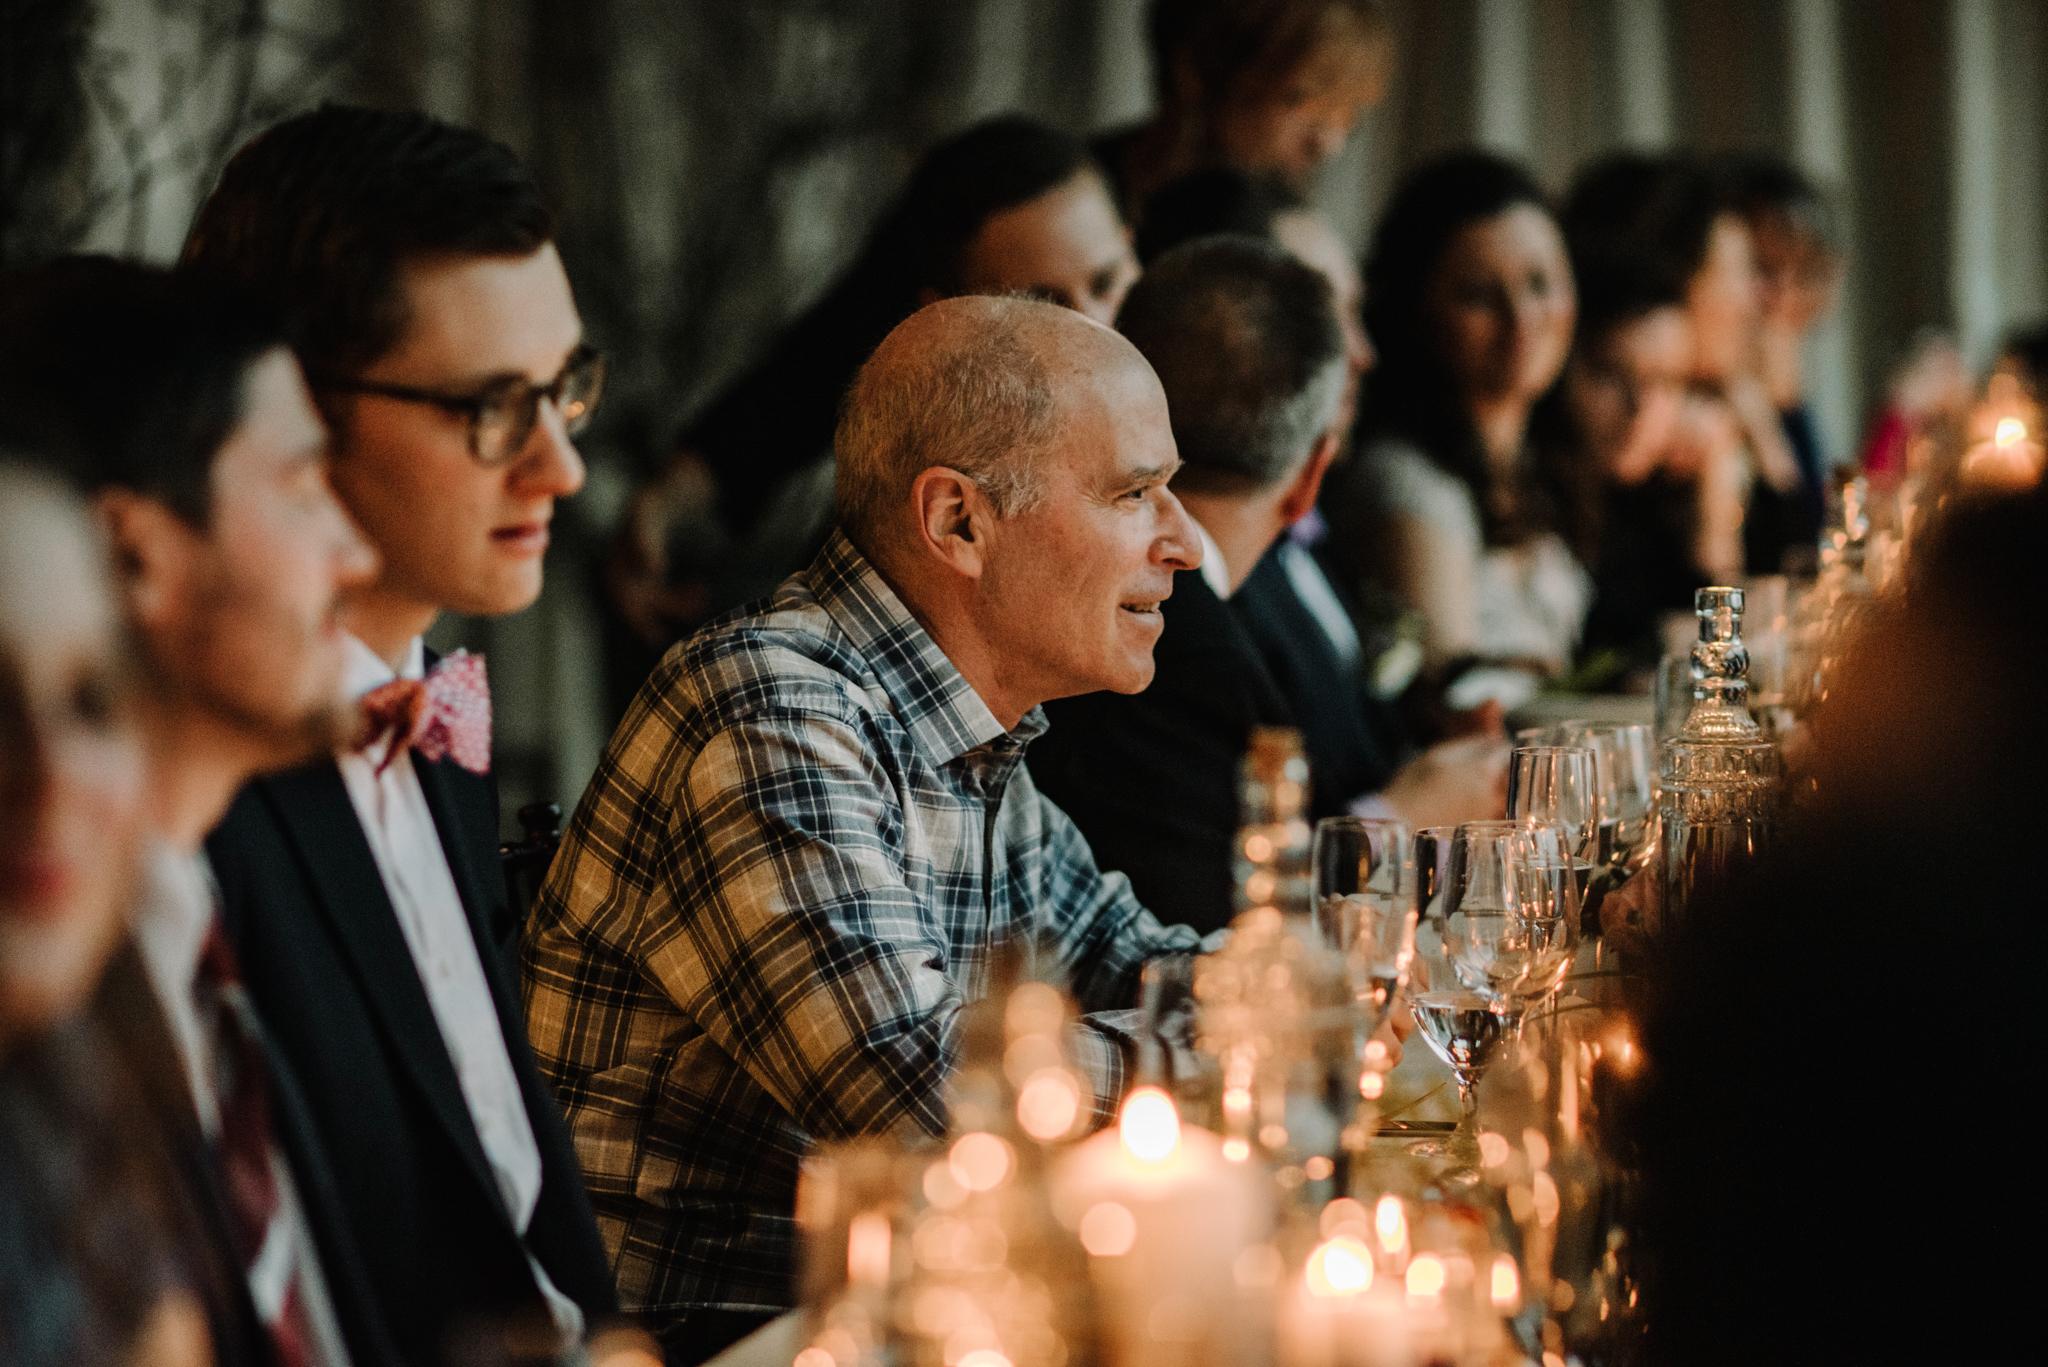 Intimate Dinner Wedding - Small Wedding with Candlelit Dinner - Sperryville Virginia Wedding - Backyard Wedding - Flourish Root Wedding Flowers - White Sails Creative Wedding - Cozy Wedding - Casual Wedding - Intimate Wedding_45.jpg